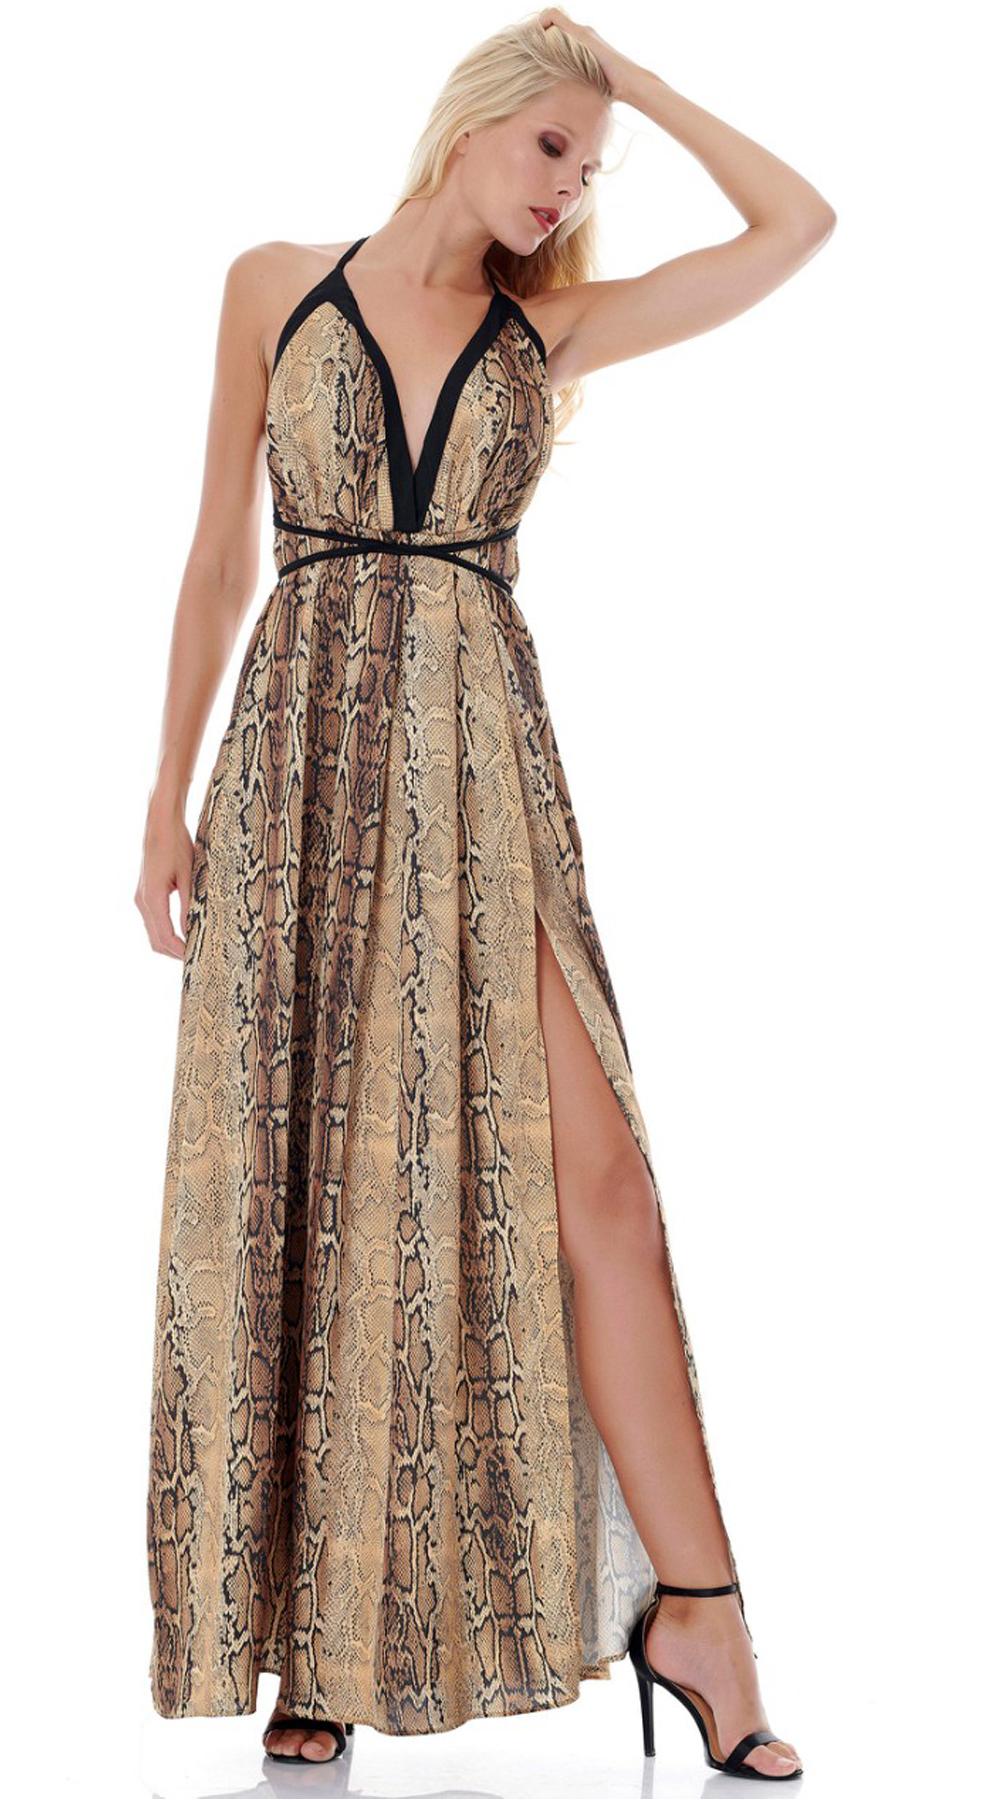 Snake Print Φόρεμα Εξώπλατο ONLINE - ONLINE - SS18ON-50012 φορέματα party φορέματα